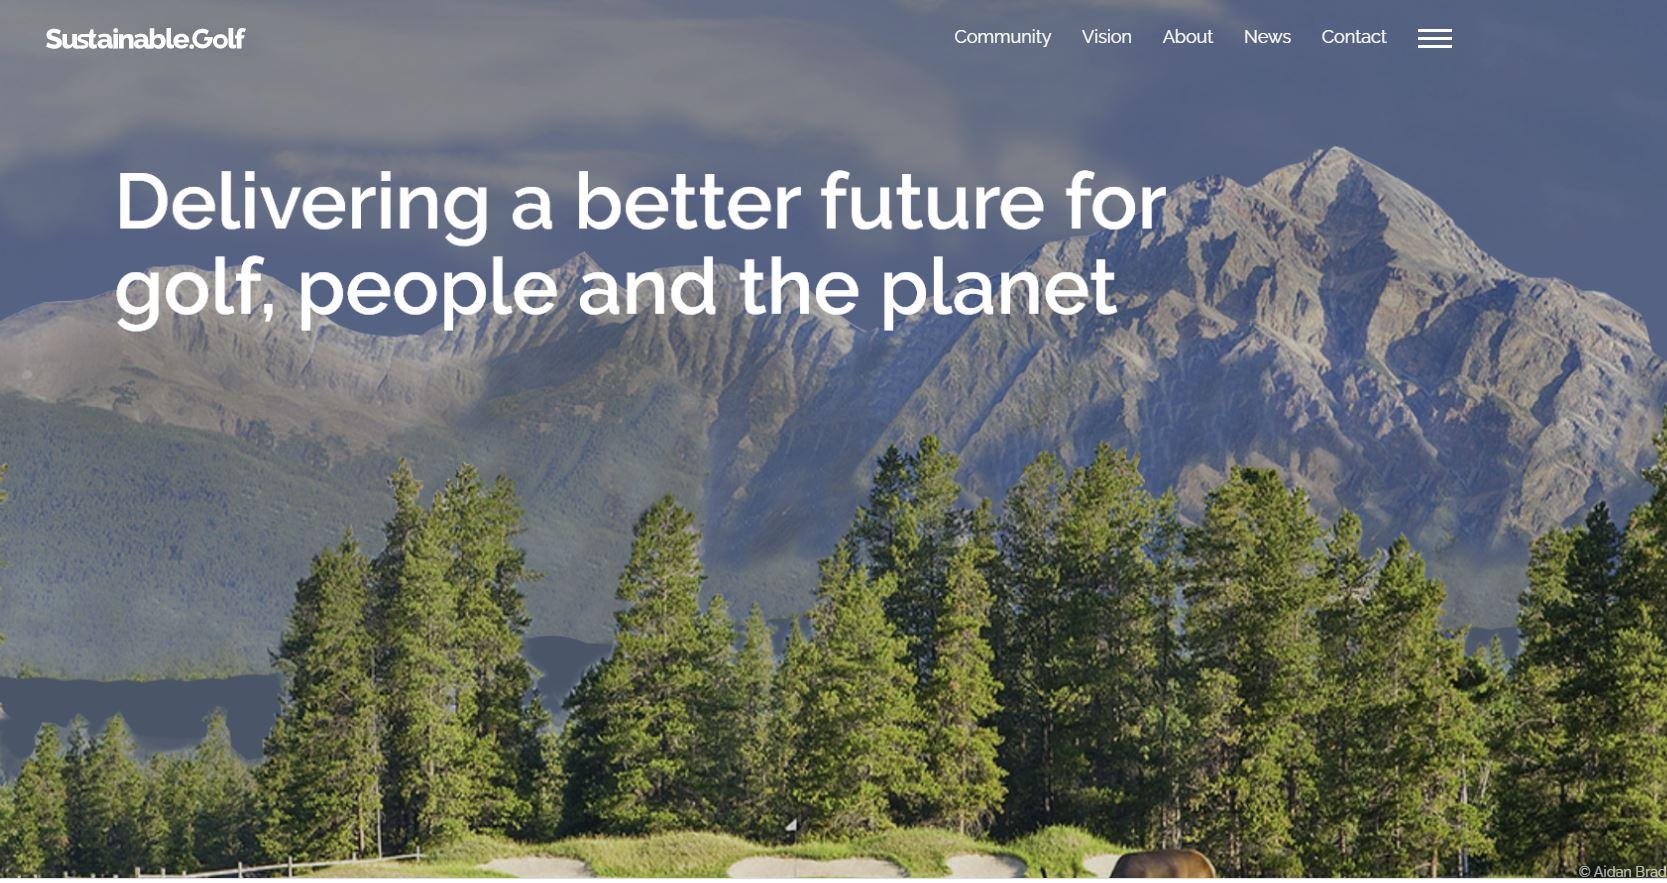 Sustainable Golf screengrab